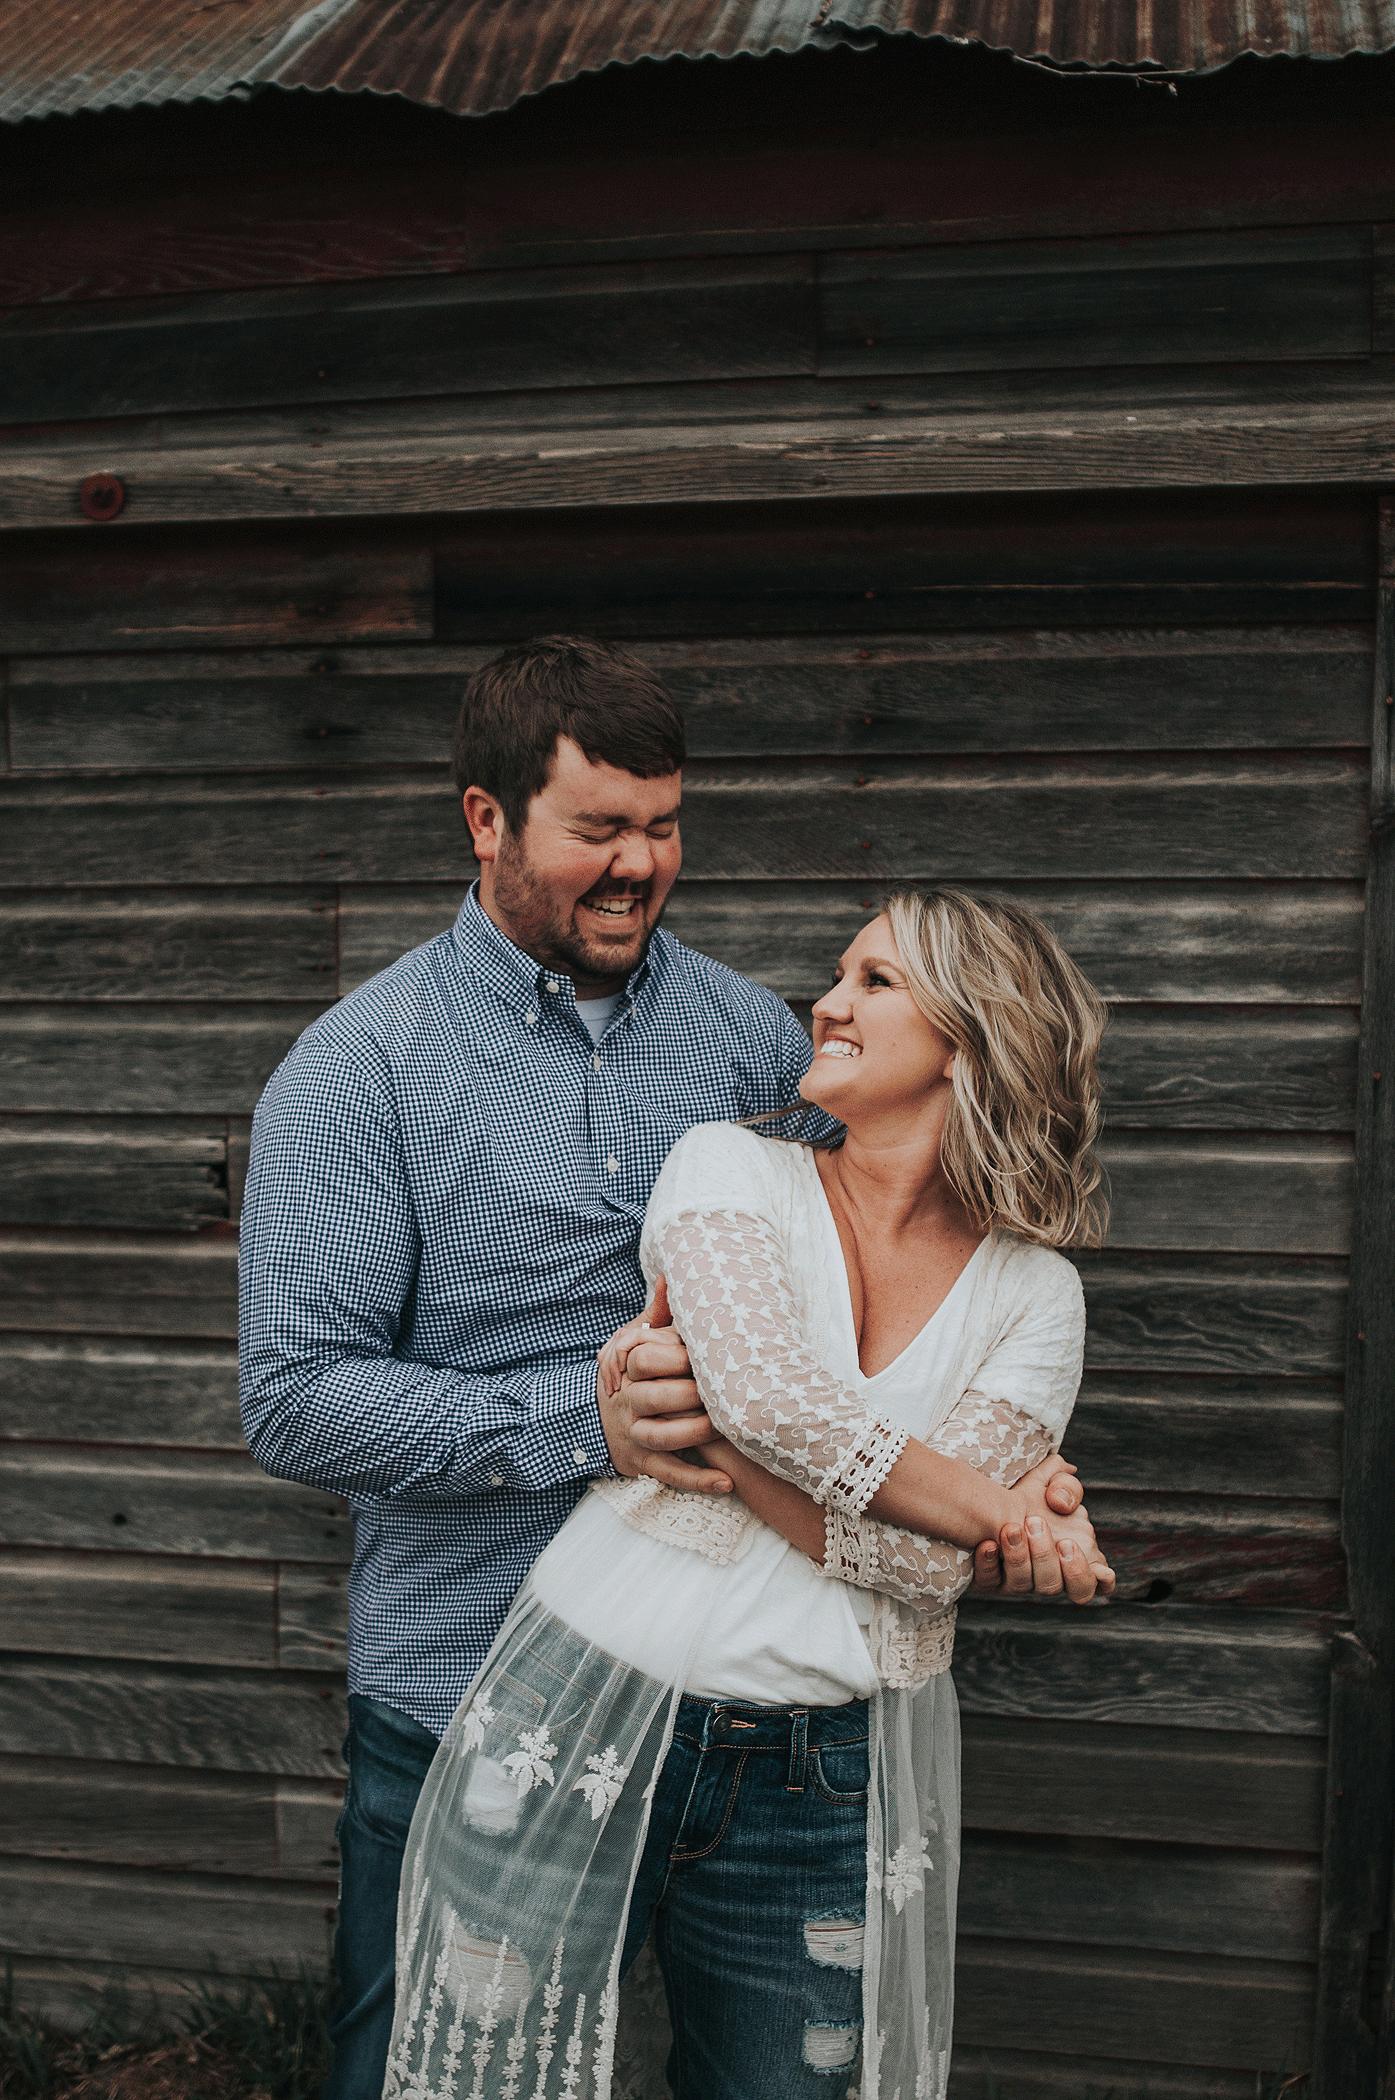 kaylie-sirek-nebraska-wedding-engagement-photographer-photography-grand-island-kearney-hastings-lincoln-15.png